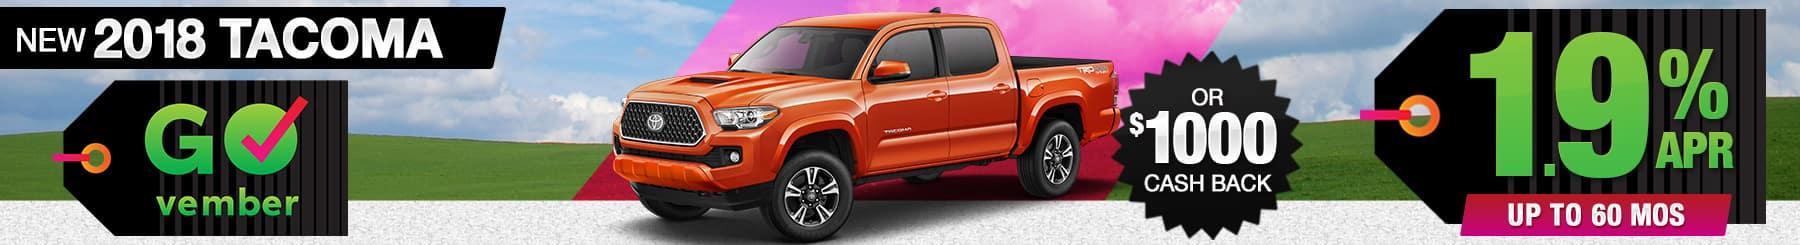 Toyota-Tacoma Finance-Cash Back Special